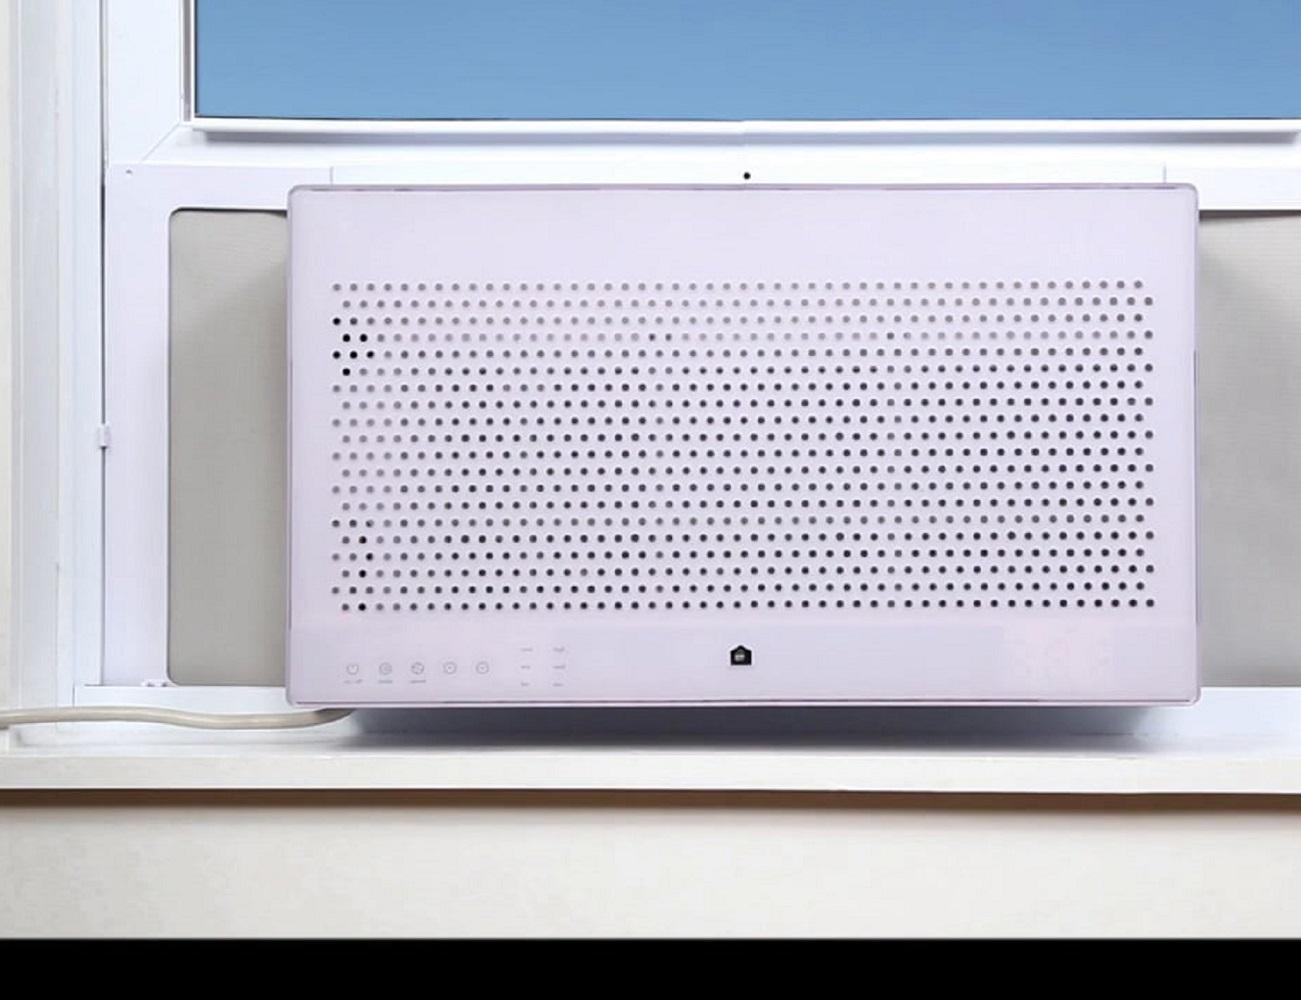 Aros Smart Window Air Conditioner